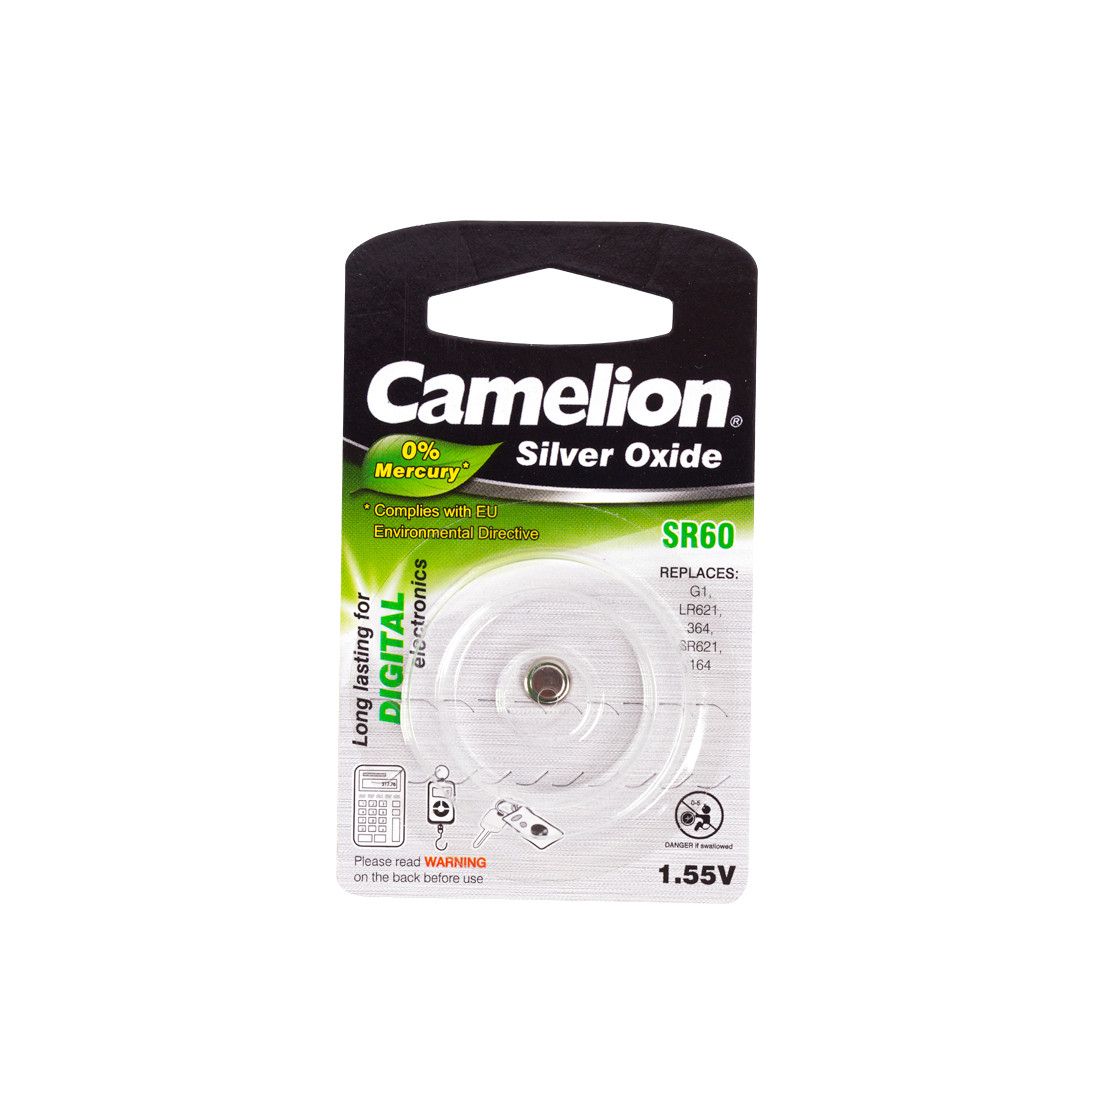 Батарейка CAMELION SR60-BP1(0%Hg)  Silver Oxide 1.55V 0% Ртути 1 шт. Блистер